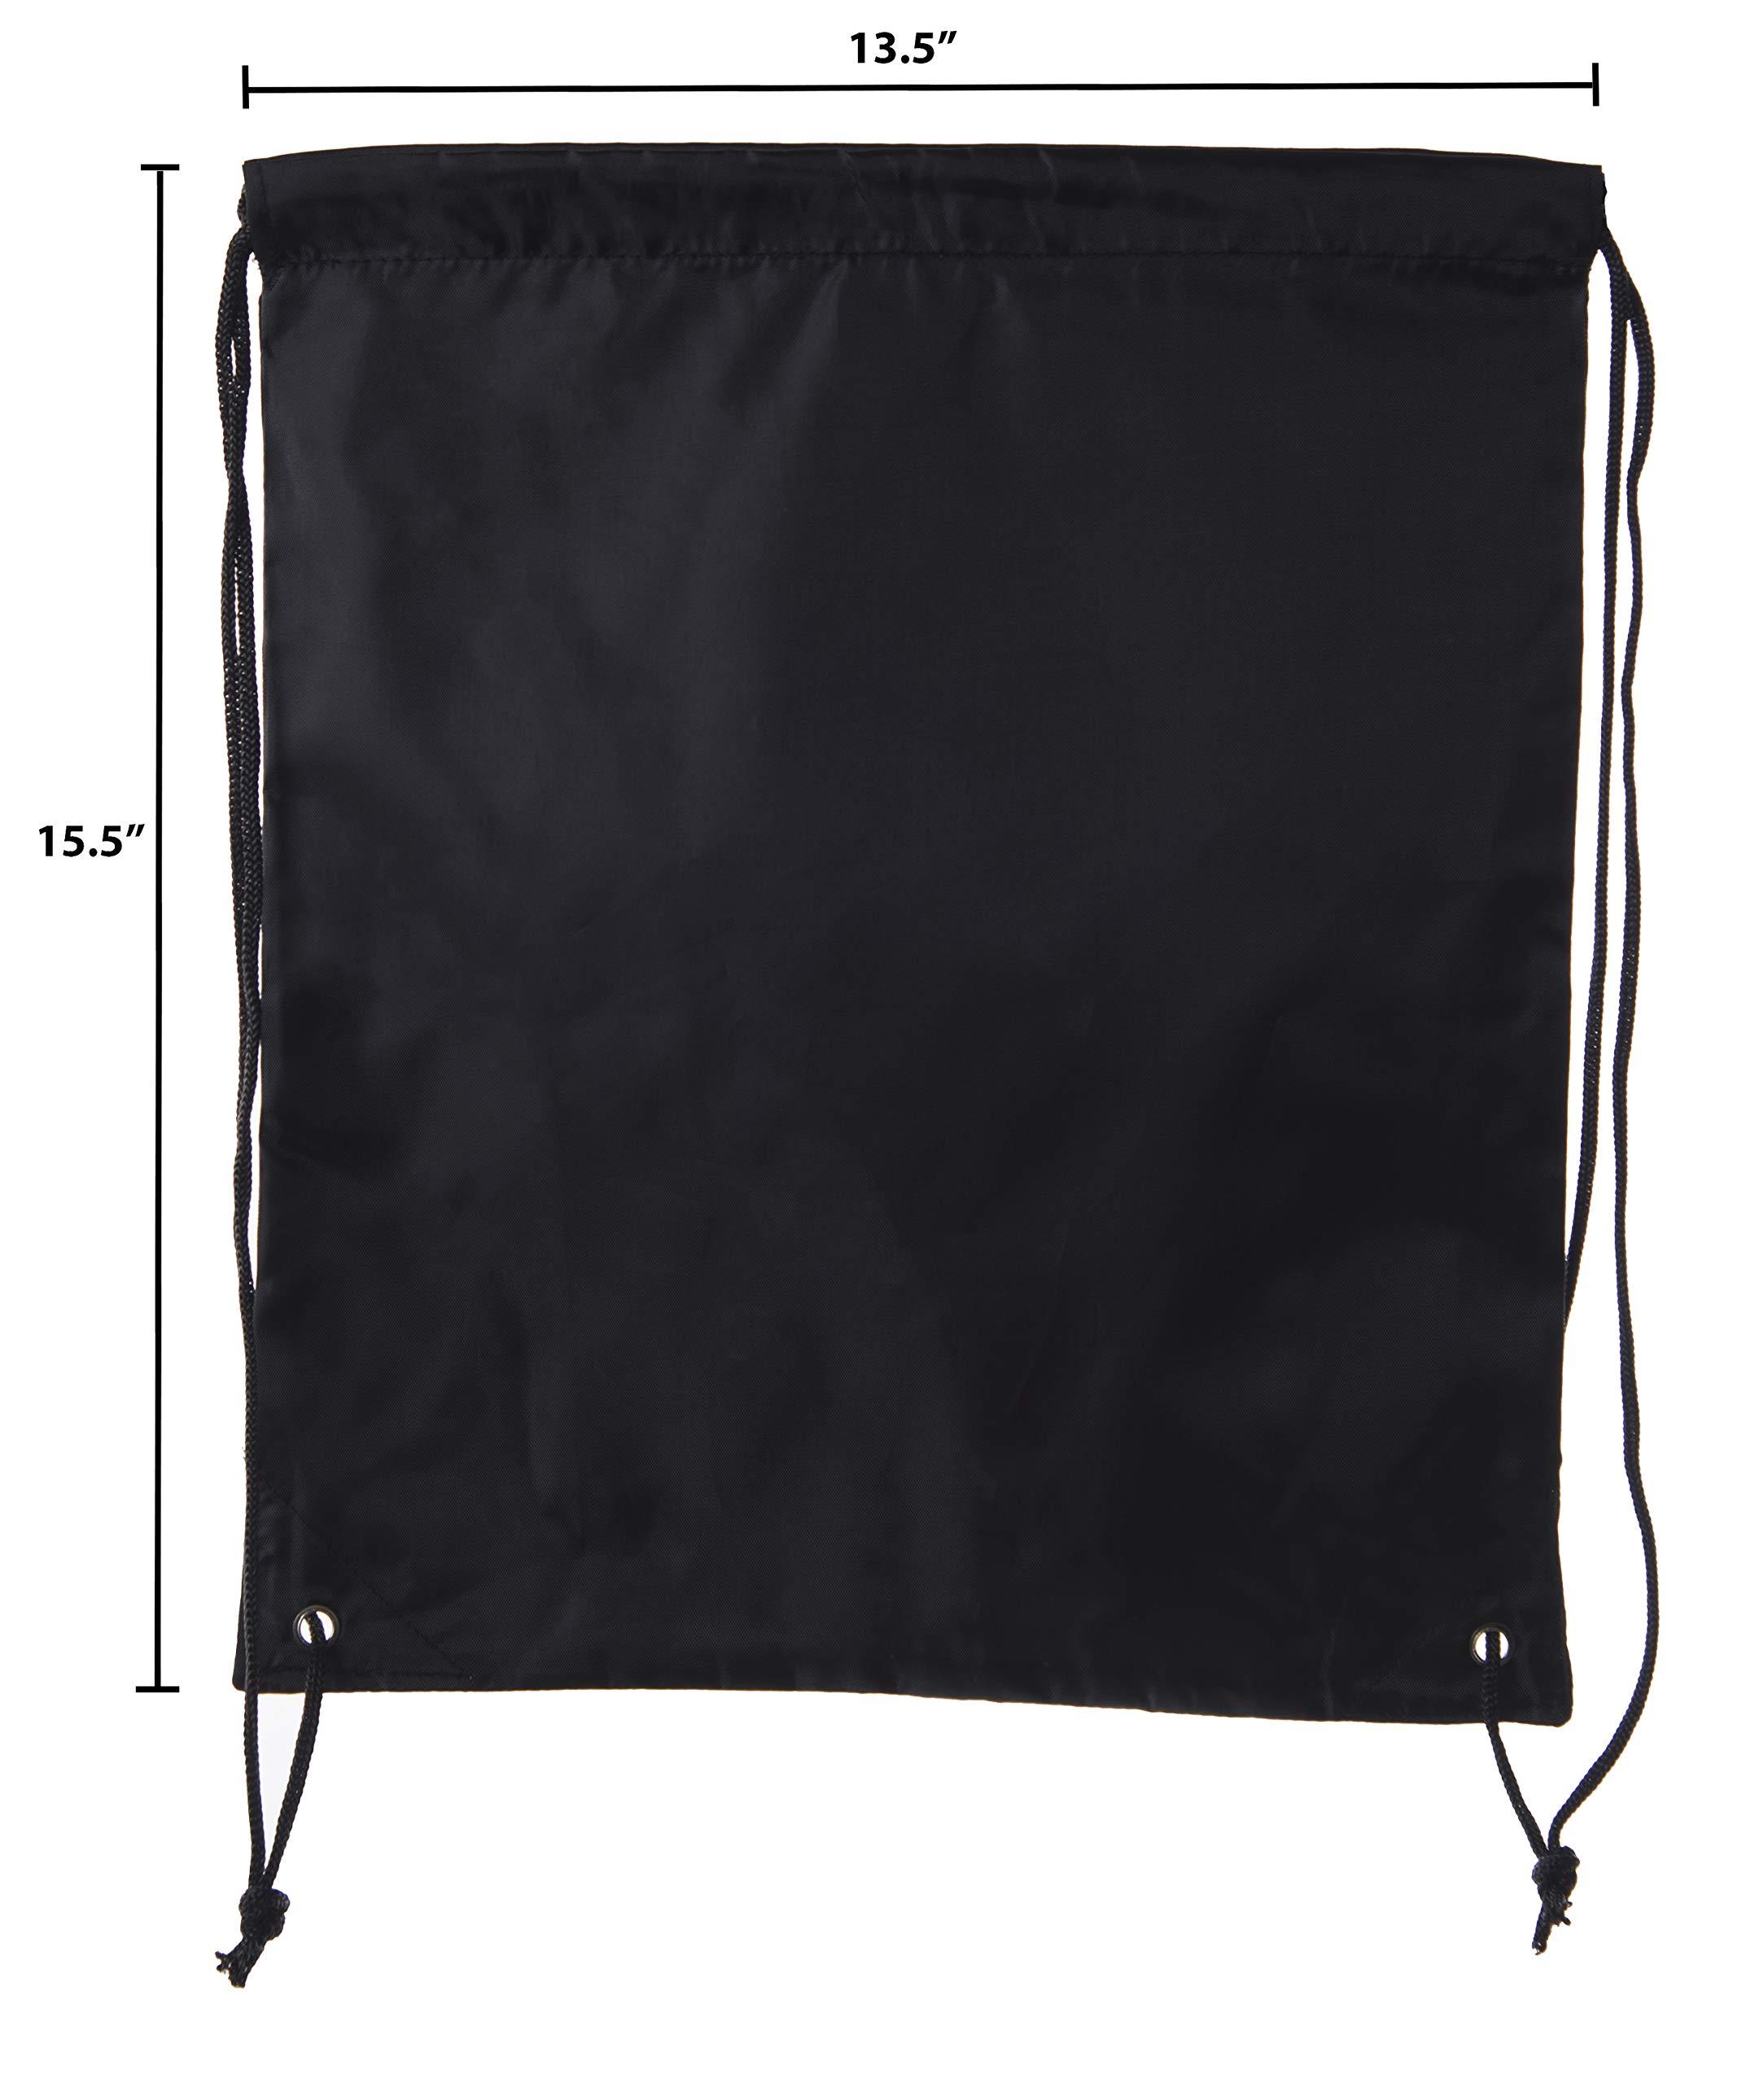 Mato & Hash Drawstring Bulk Bags Cinch Sacks Backpack Pull String Bags   15 Colors   1PK-100PK Available by Mato & Hash (Image #3)